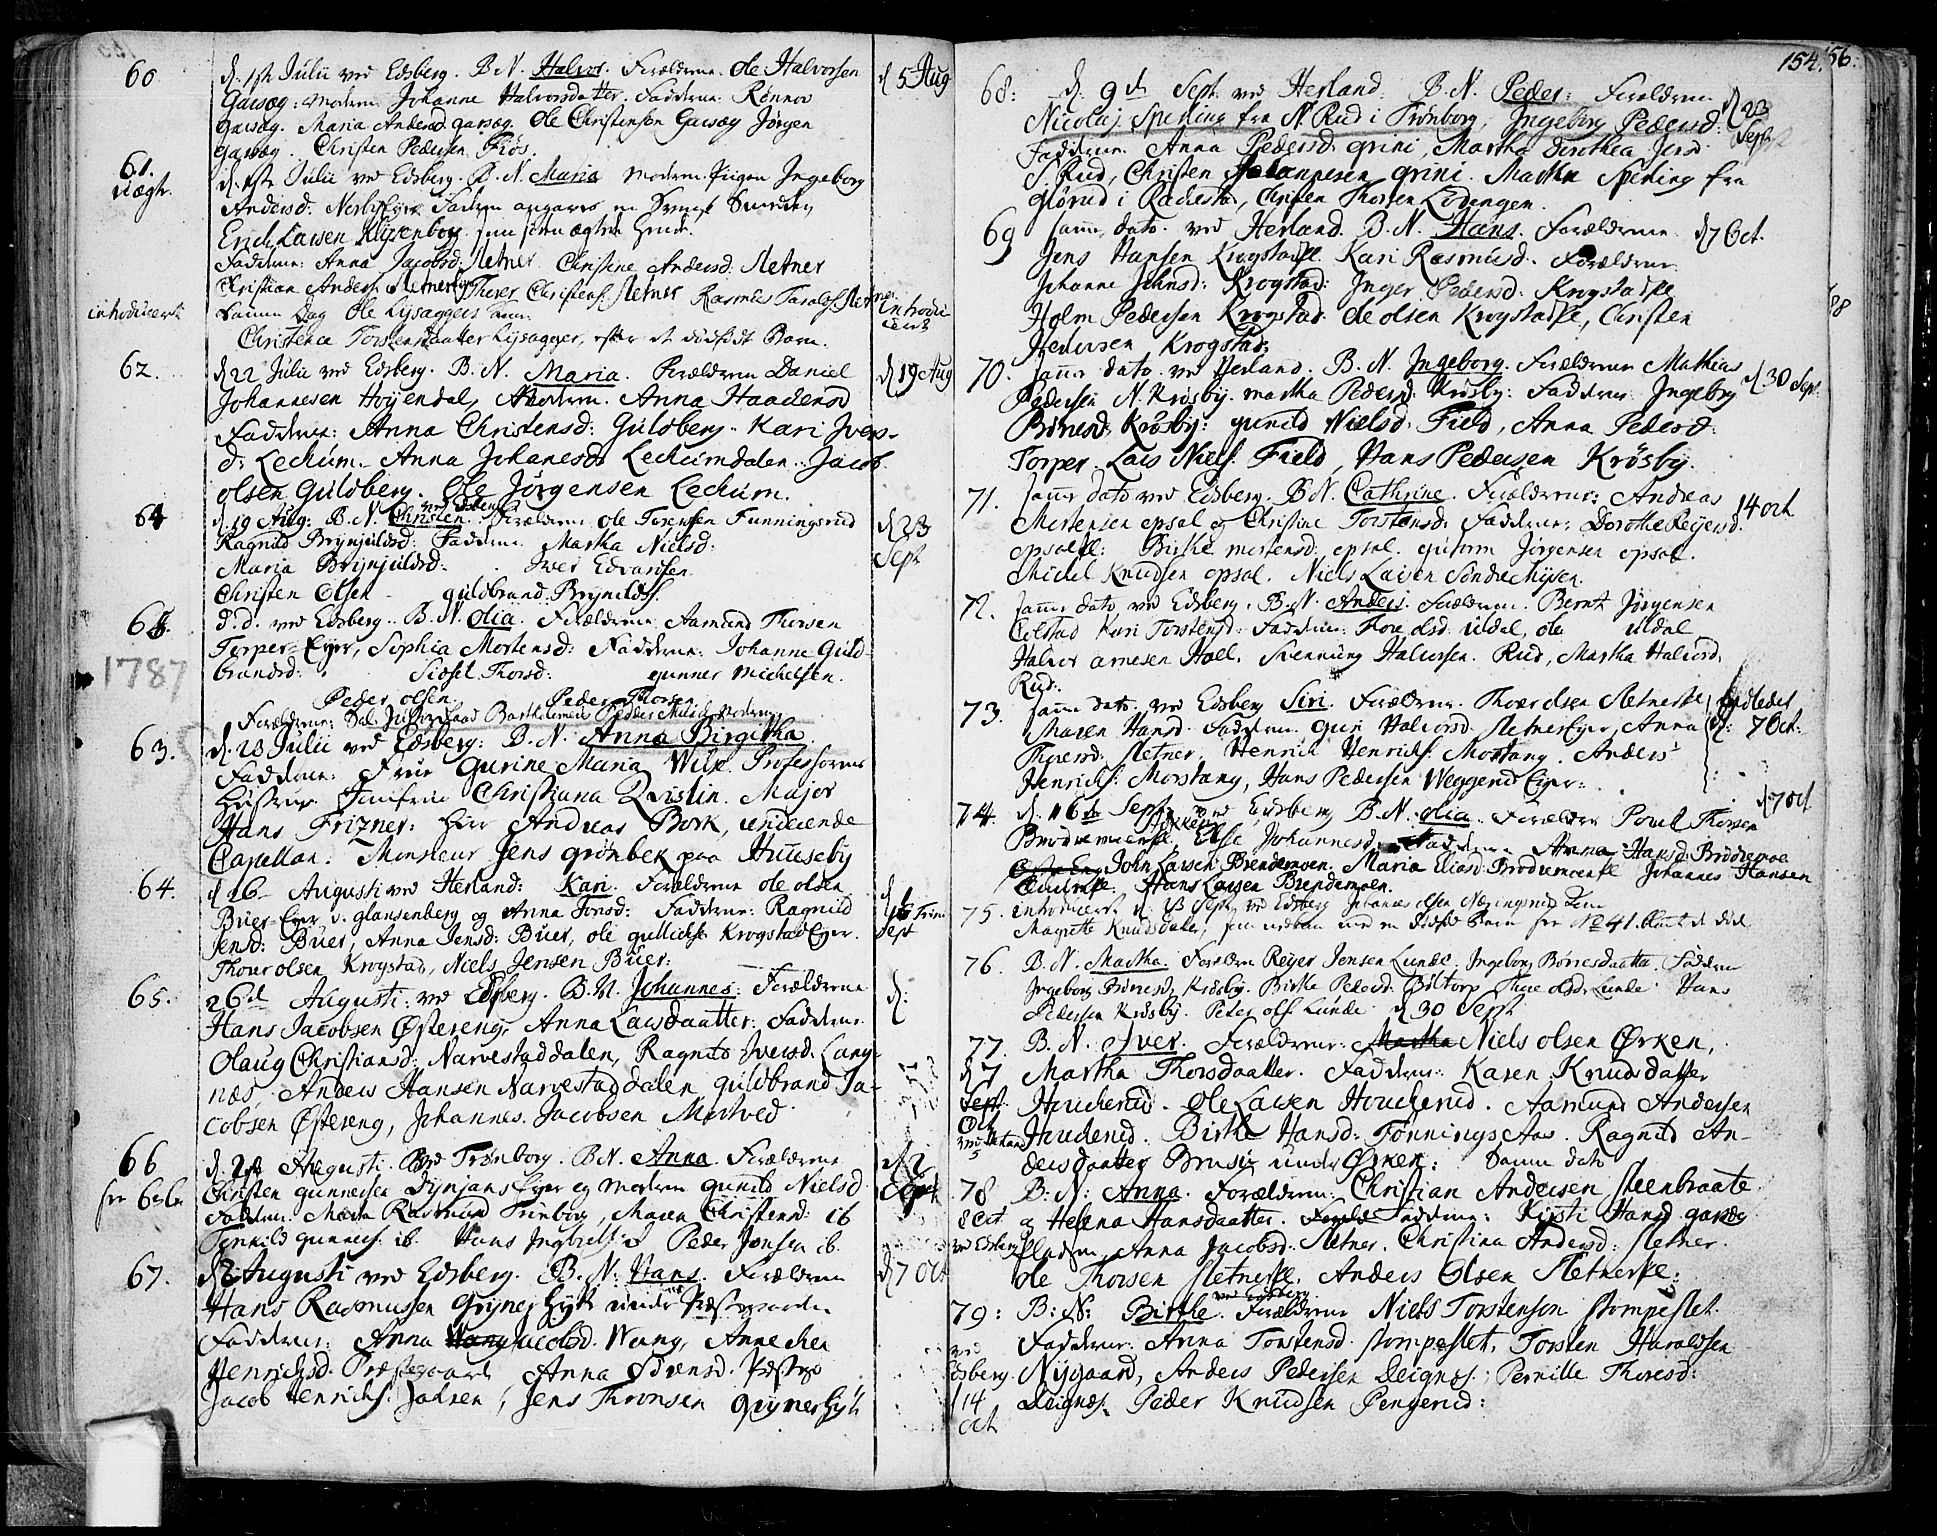 SAO, Eidsberg prestekontor Kirkebøker, F/Fa/L0004: Ministerialbok nr. I 4, 1759-1788, s. 154